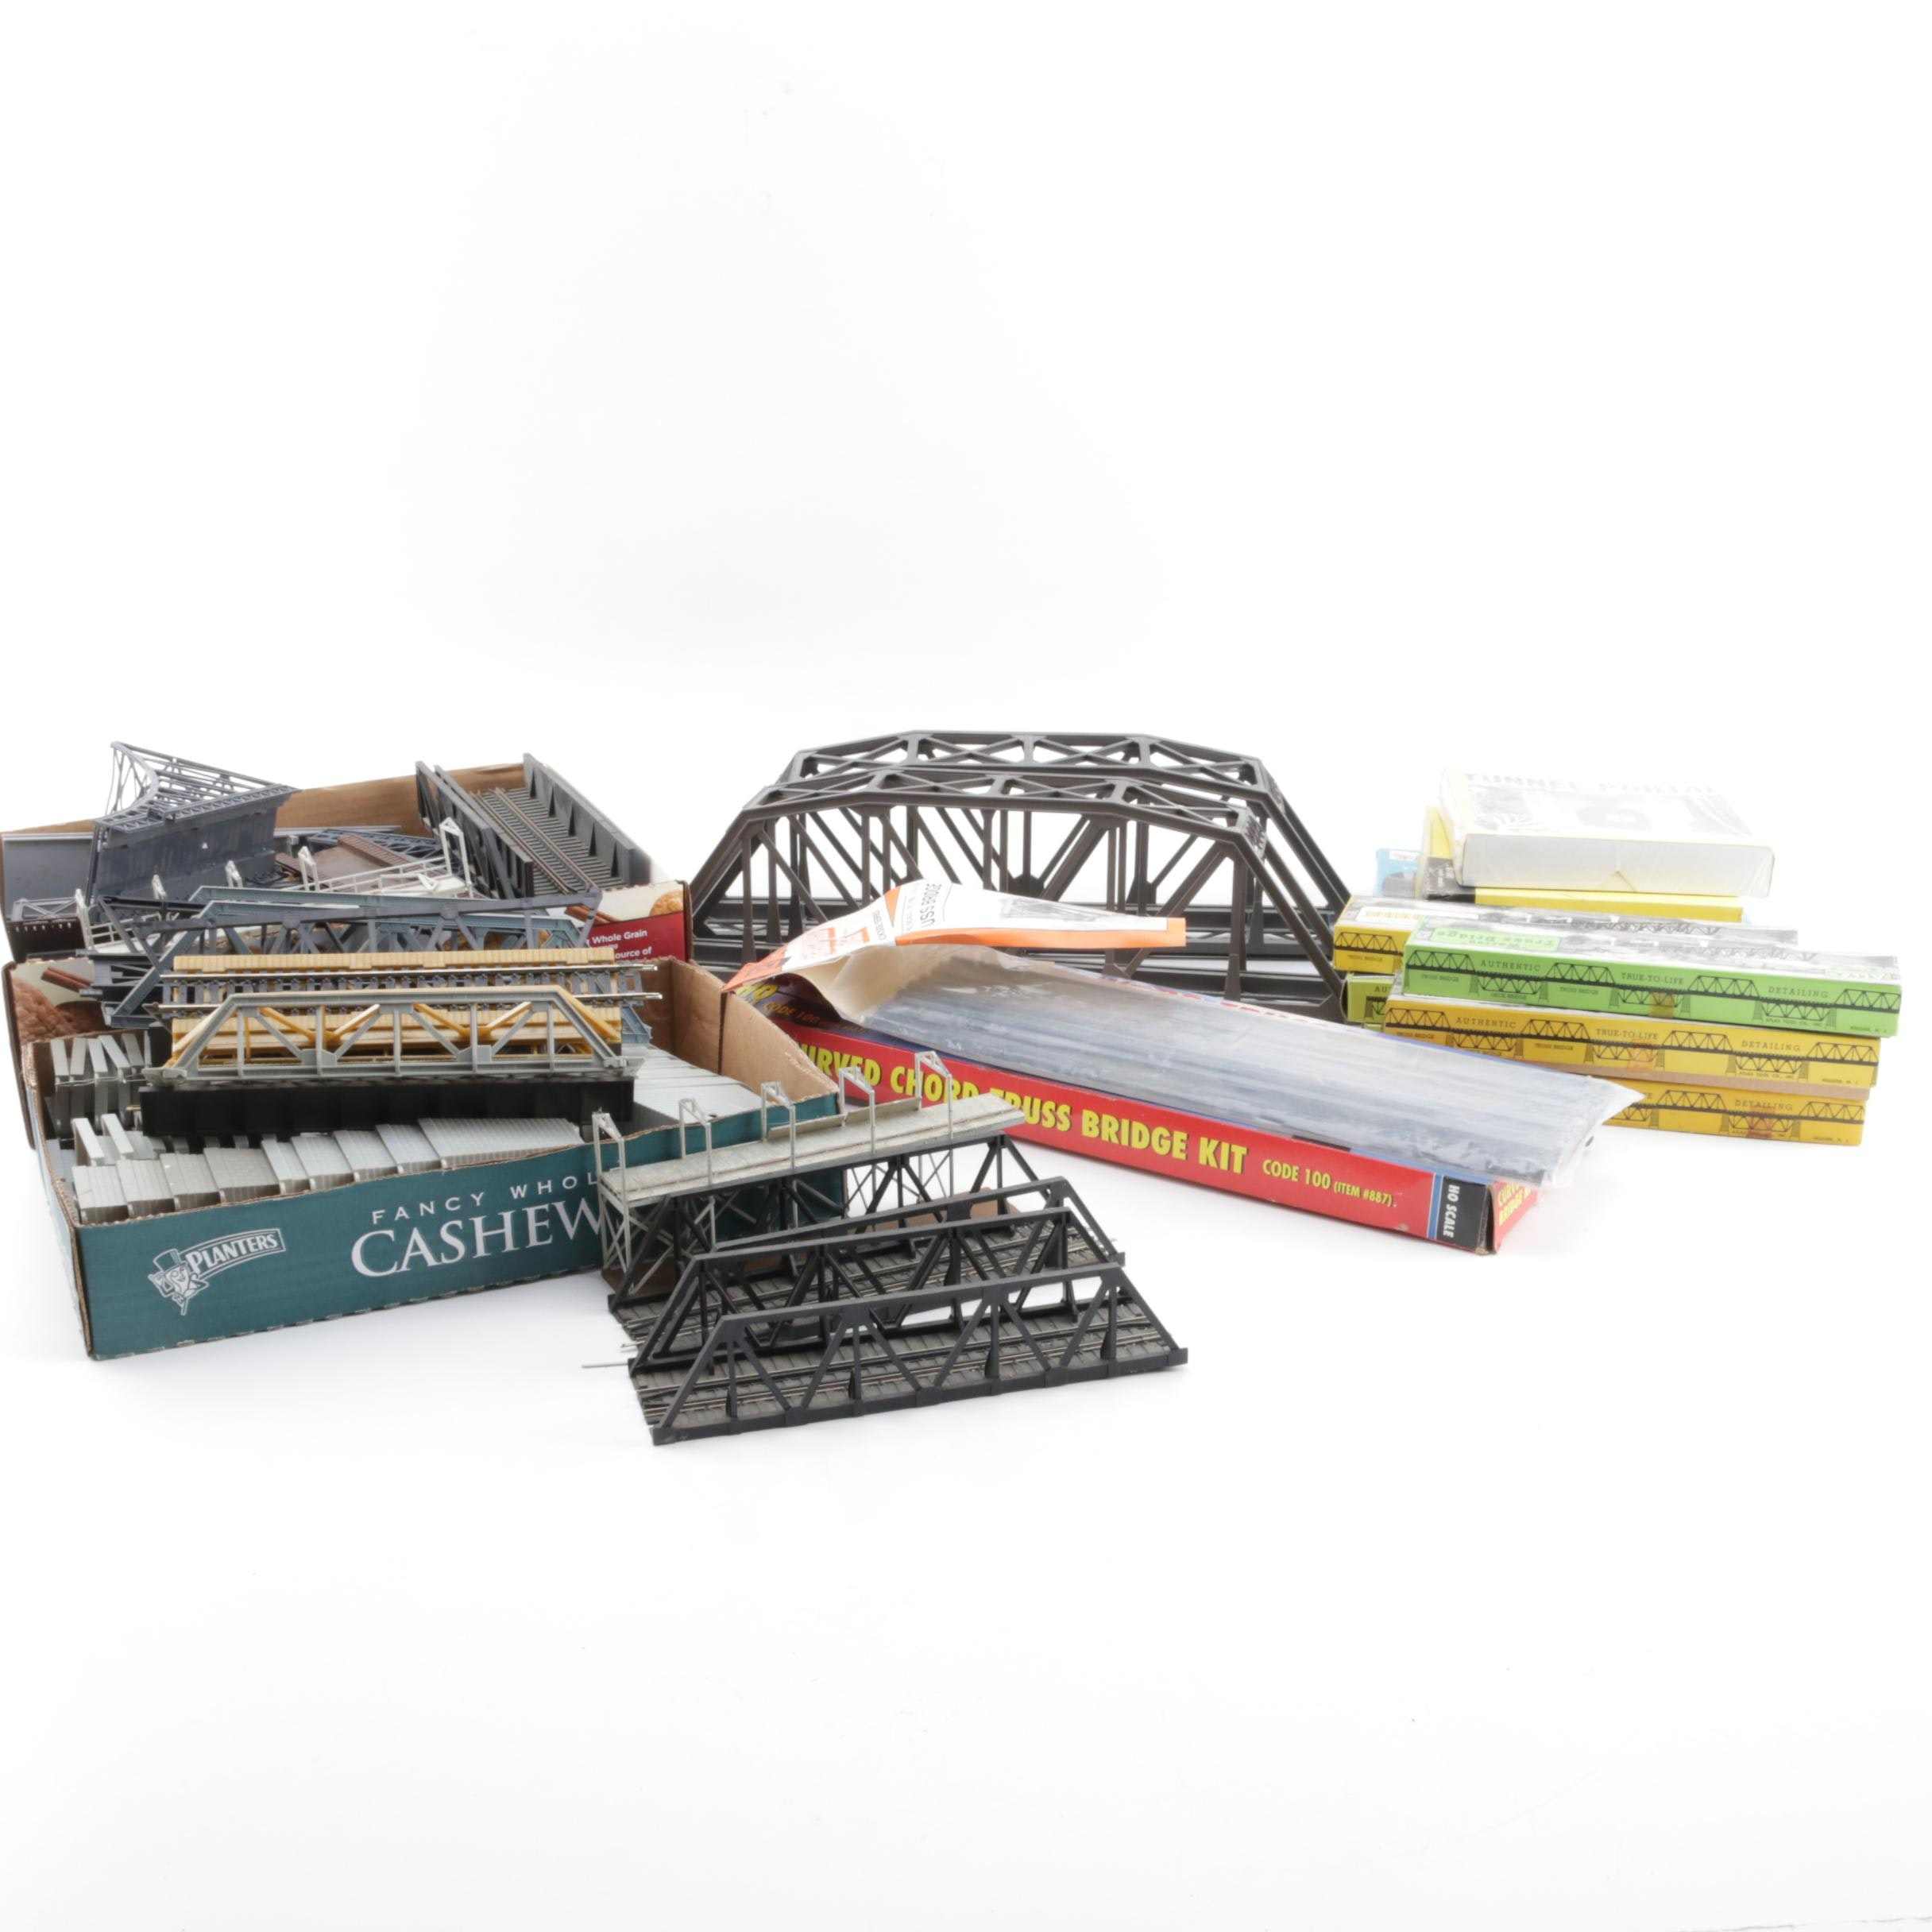 Assortment of Bridges for Model Railroads